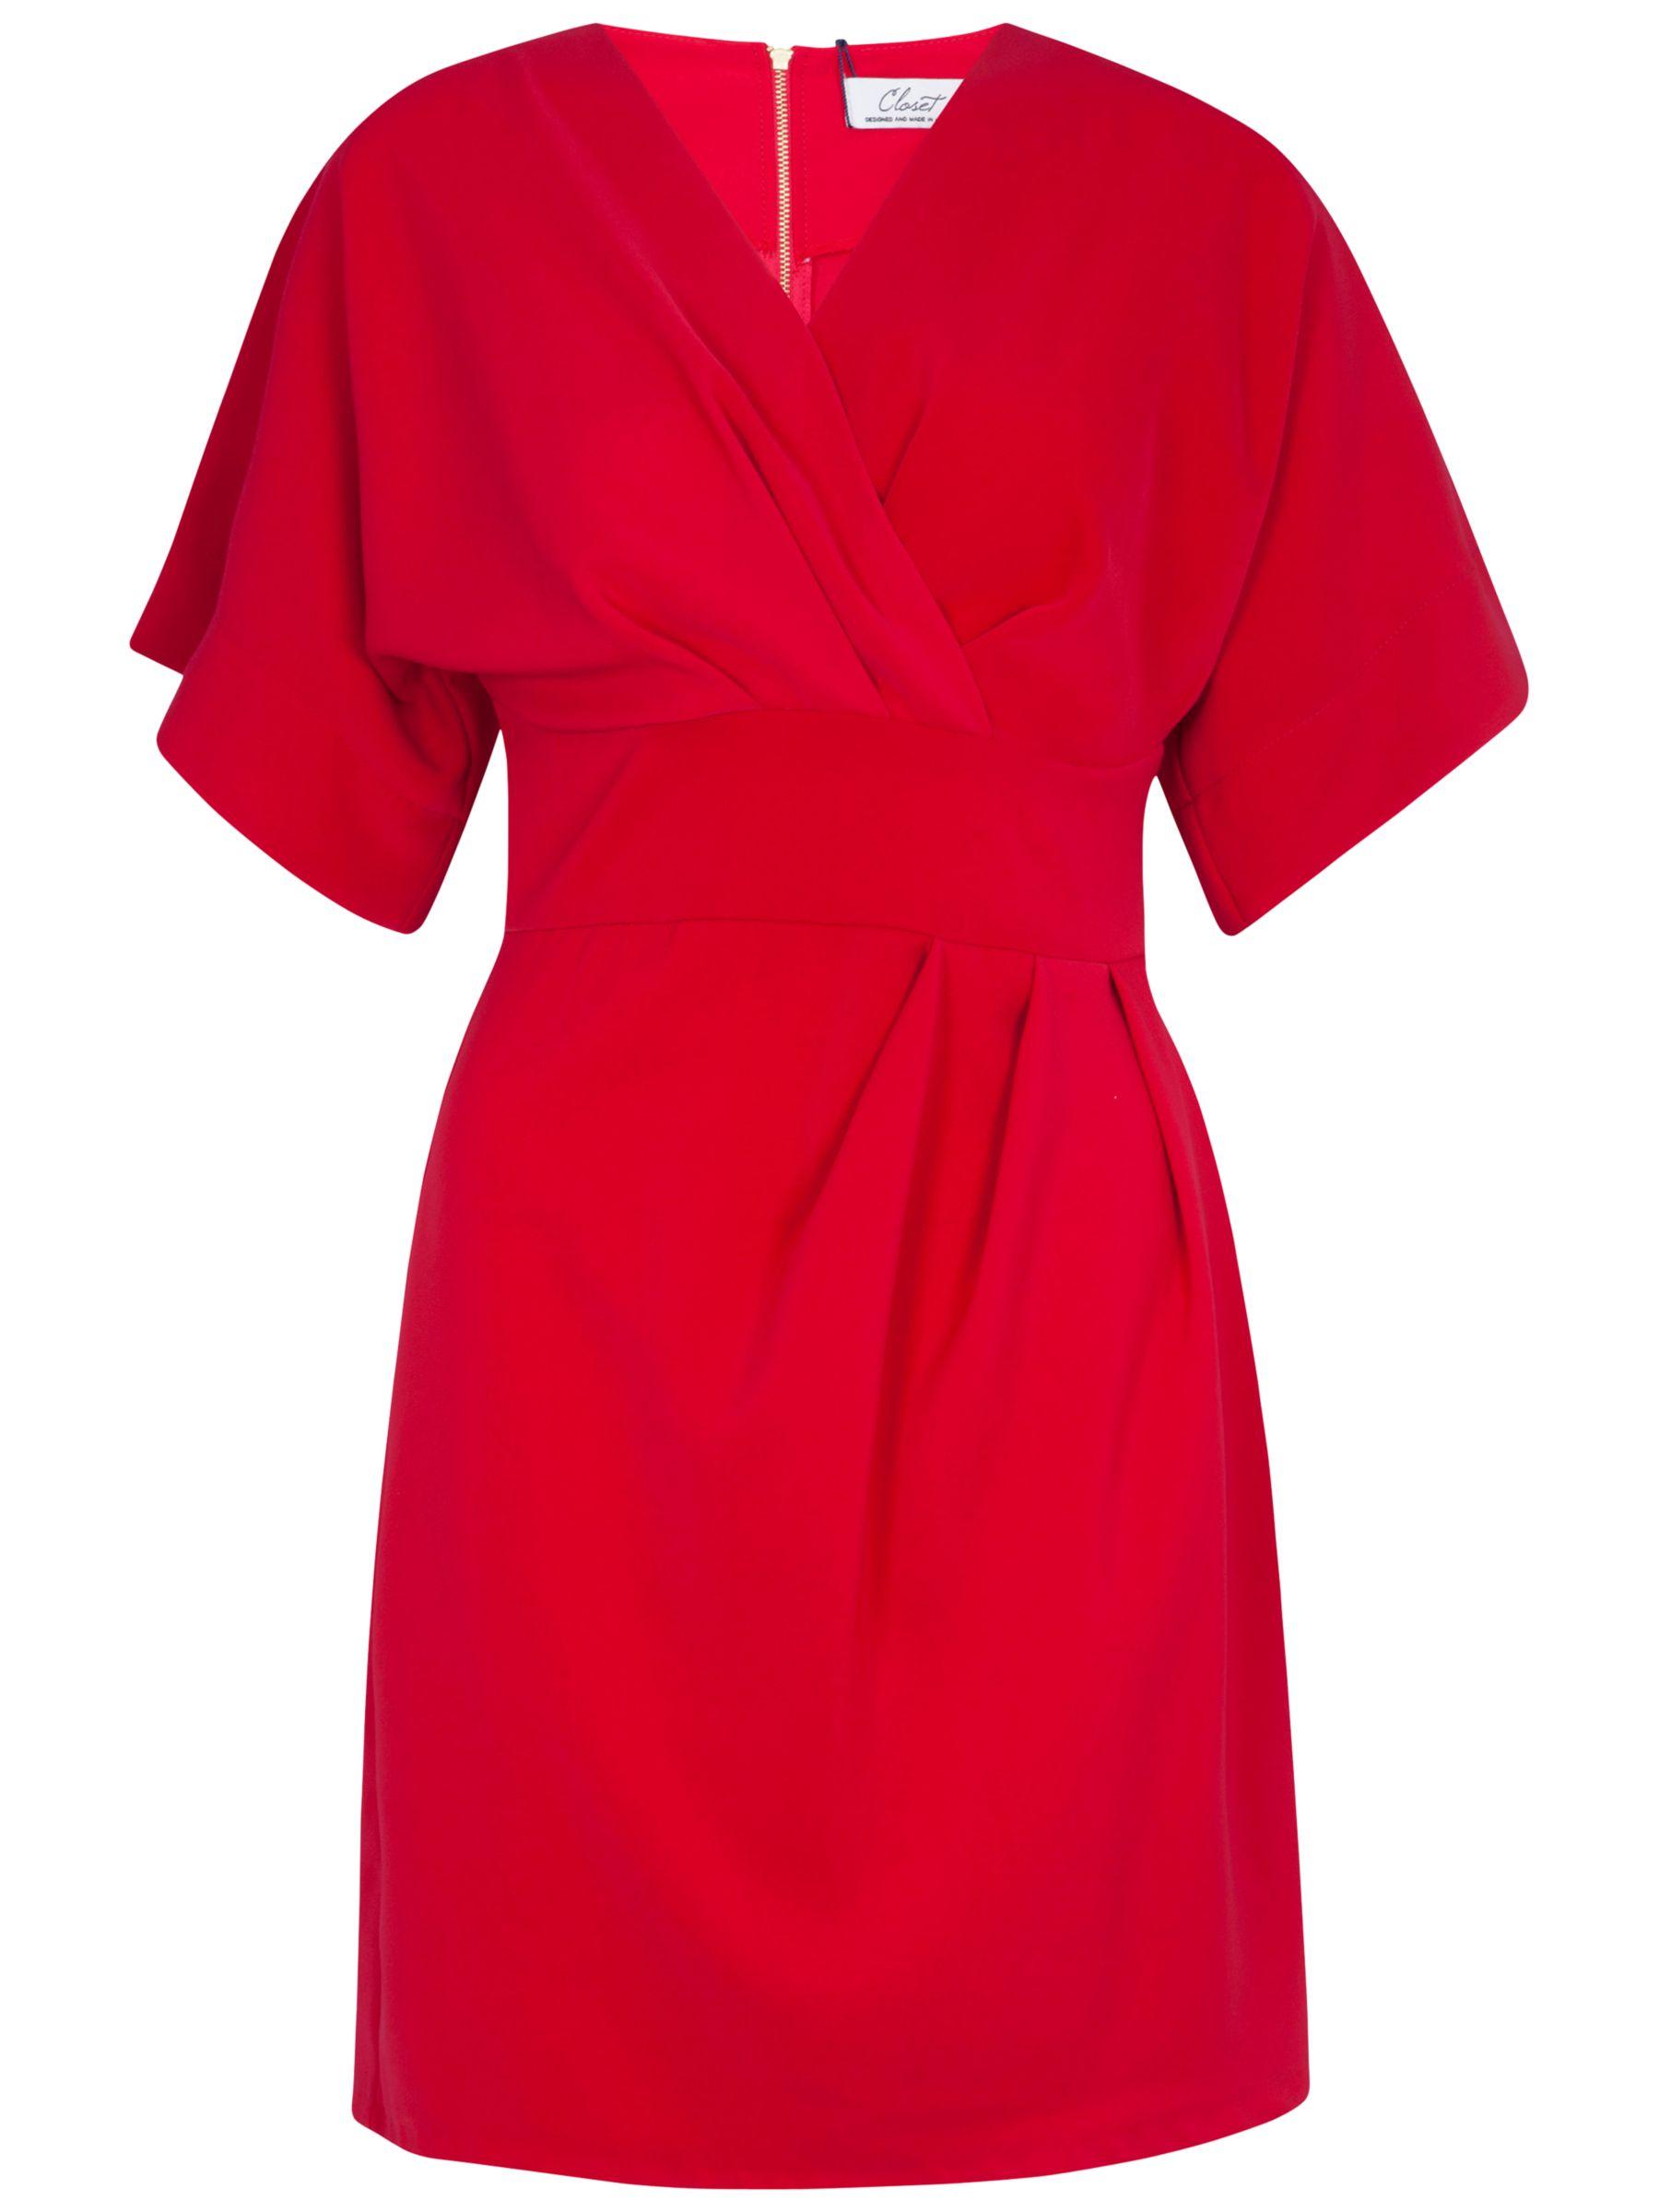 closet cross over tie back kimono dress pink, closet, cross, tie, back, kimono, dress, pink, 12|14|16|8|10, women, womens dresses, 1537142